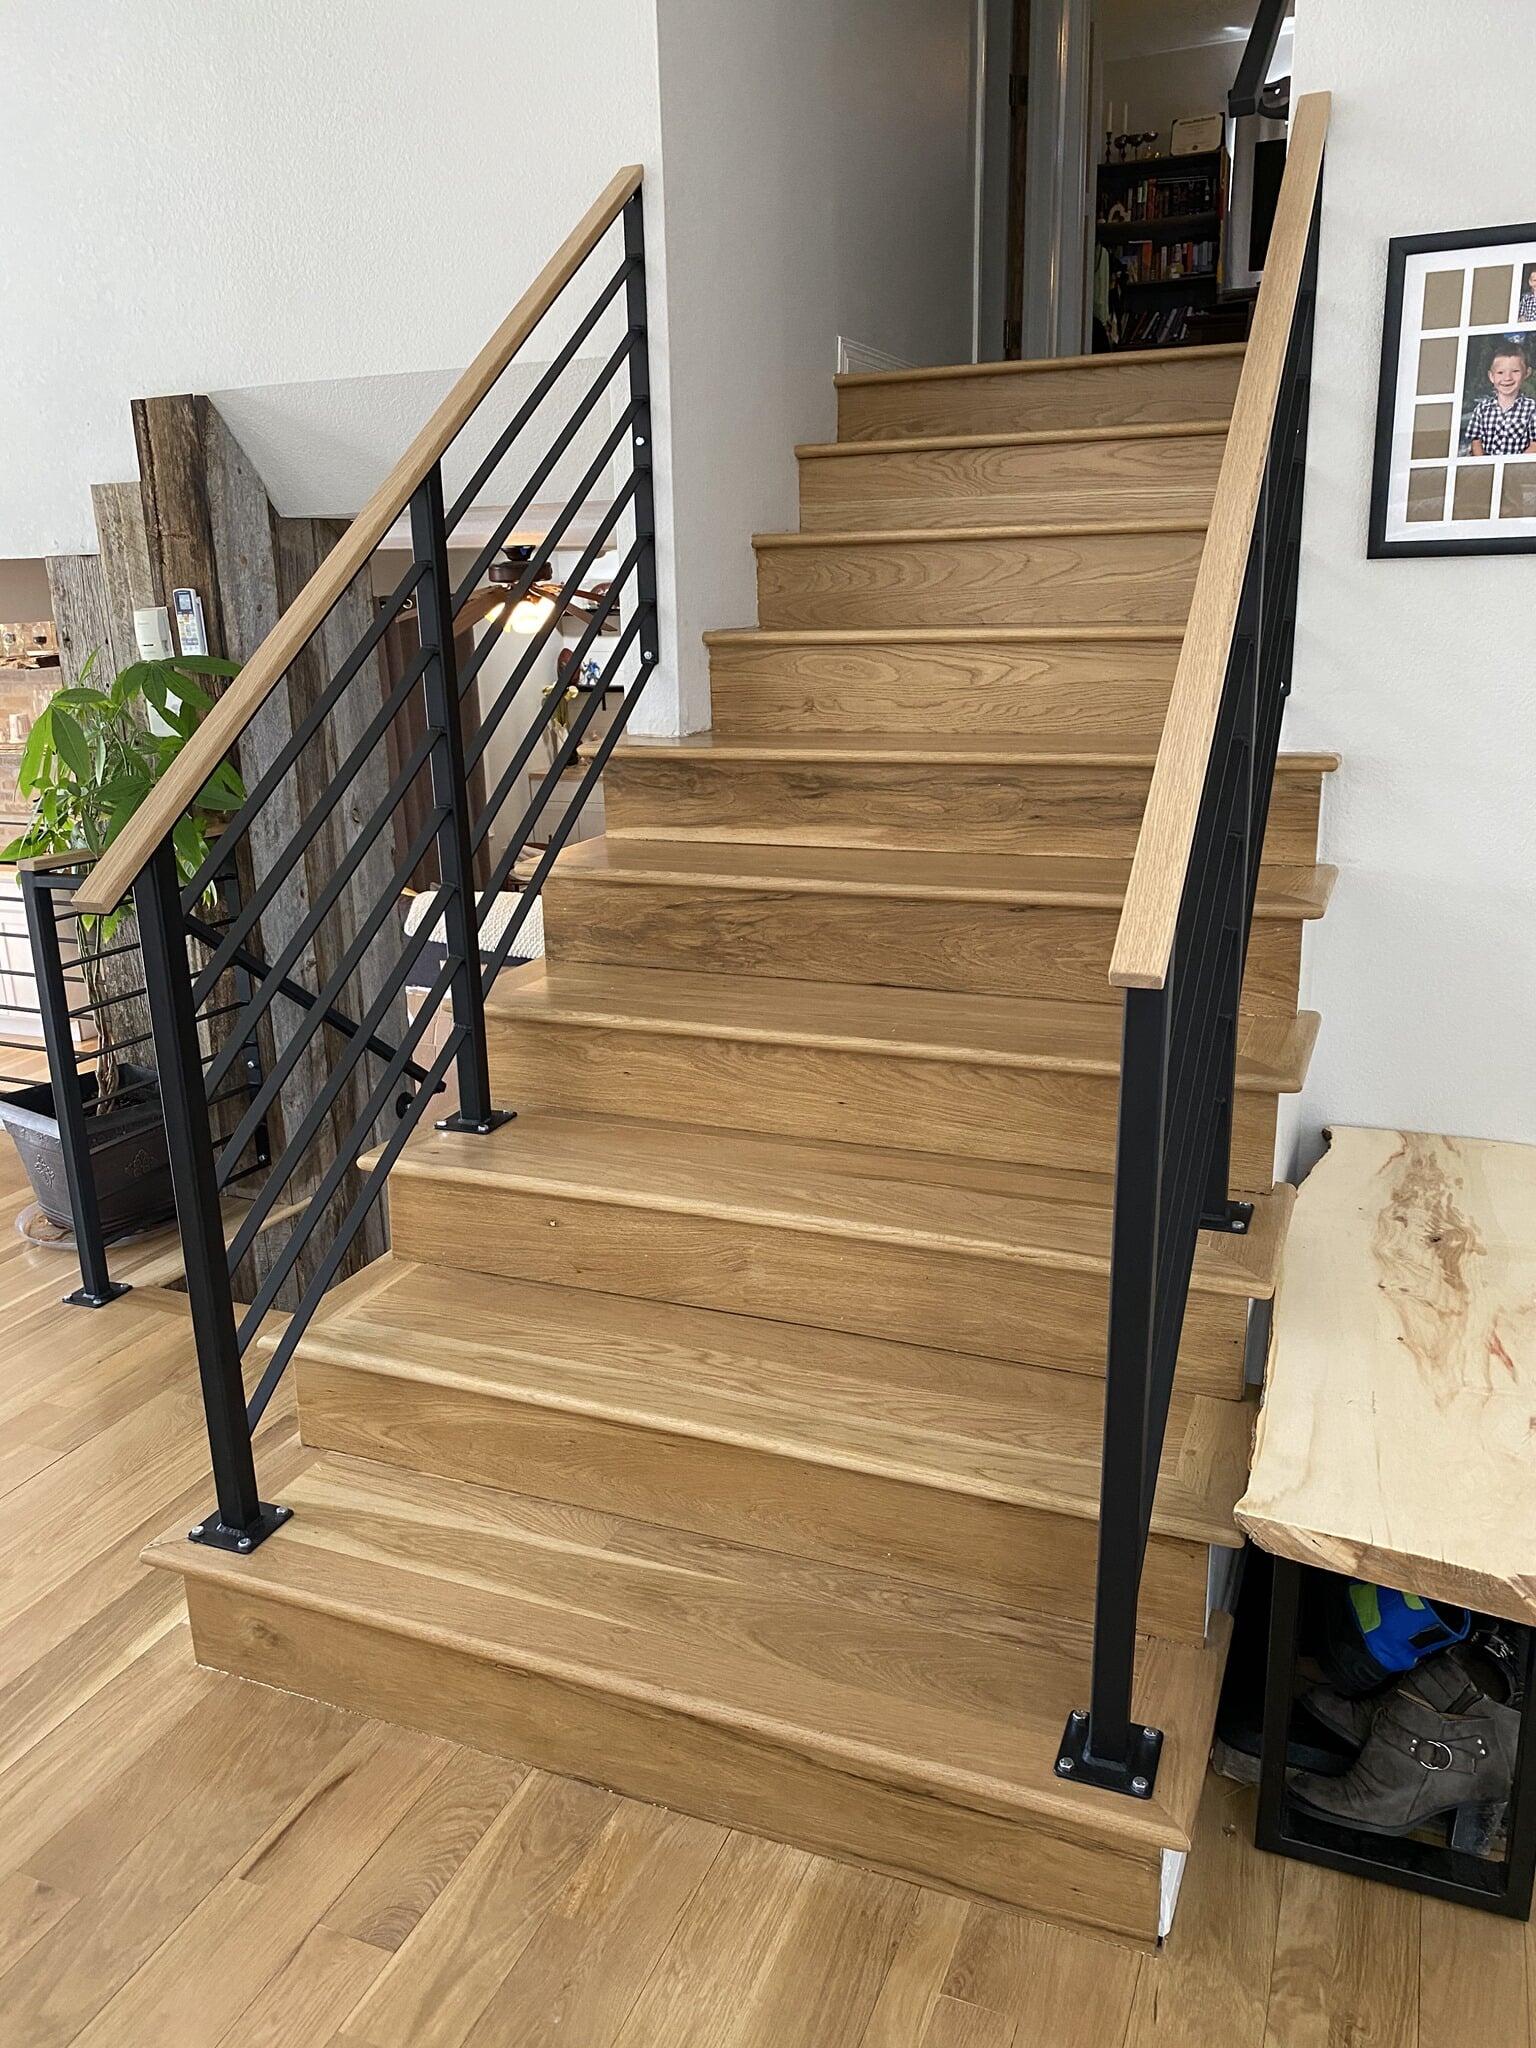 Stairway flooring installation in Timnath, CO from JT Flooring